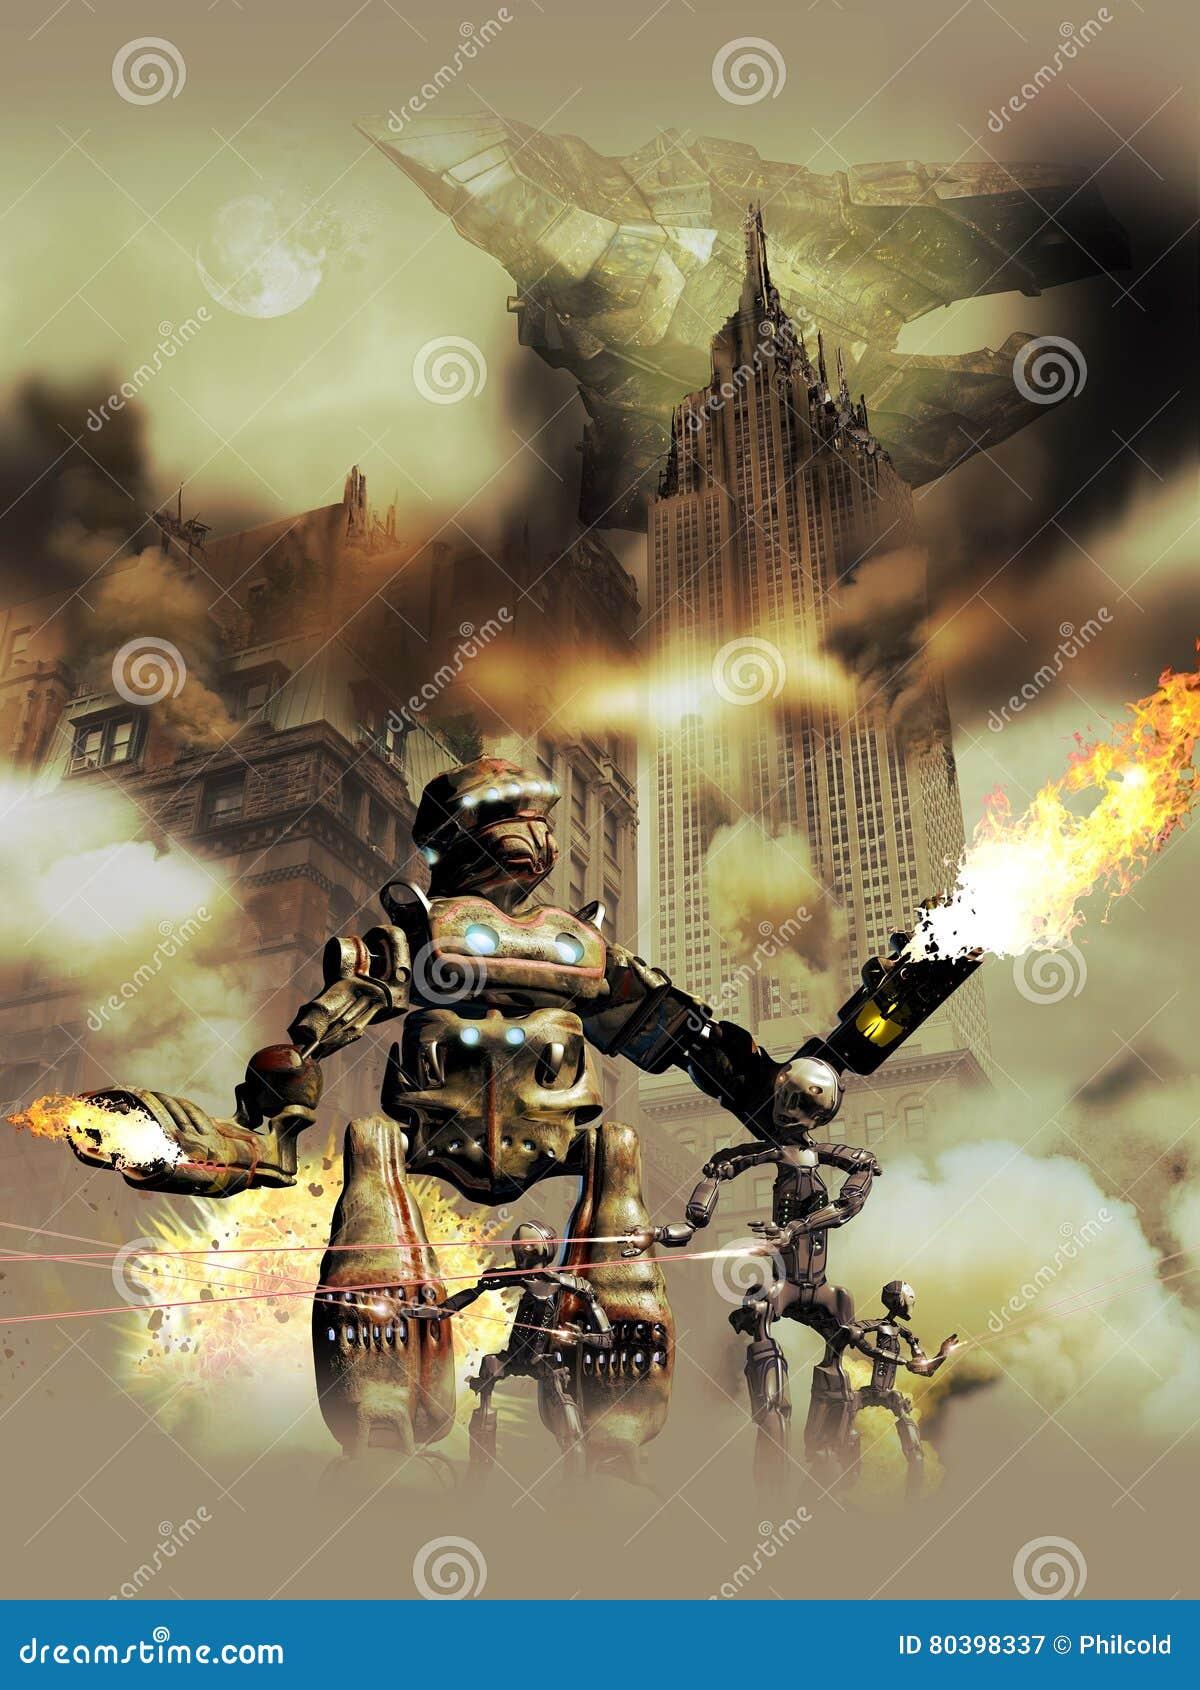 Robots étrangers envahissant la terre